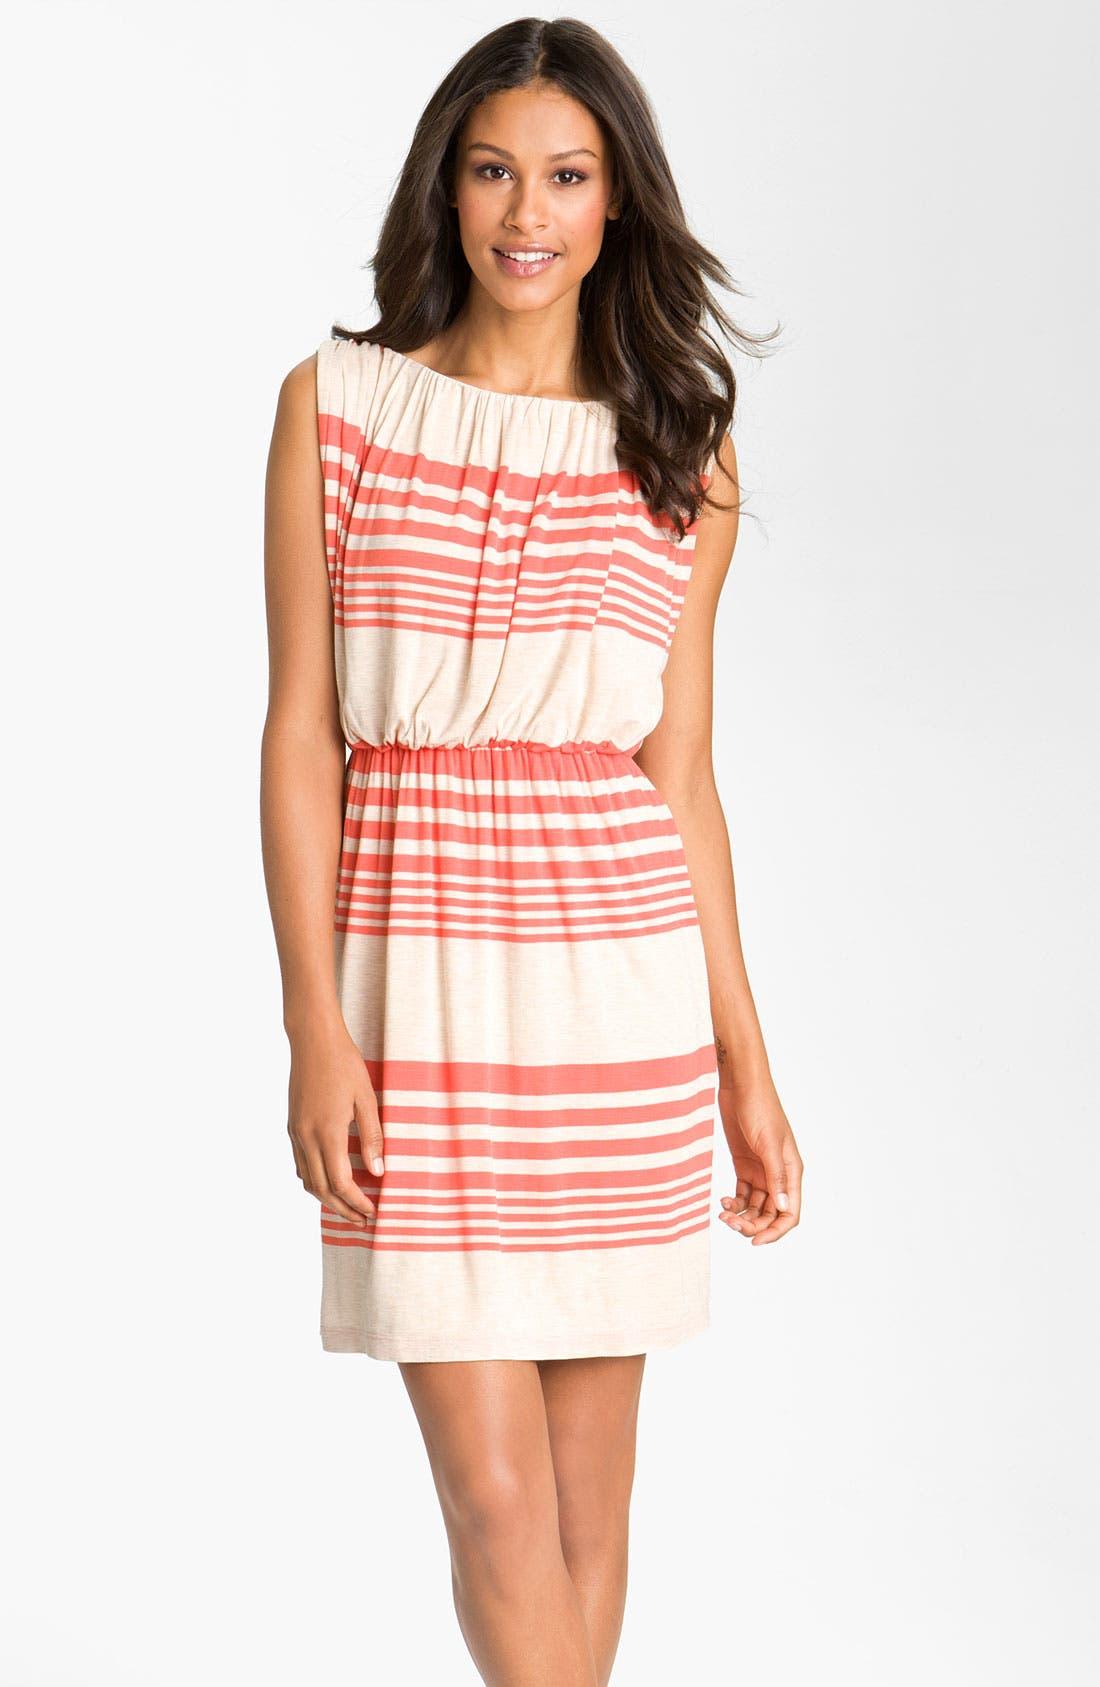 Main Image - Suzi Chin for Maggy Boutique Stripe Jersey Blouson Dress